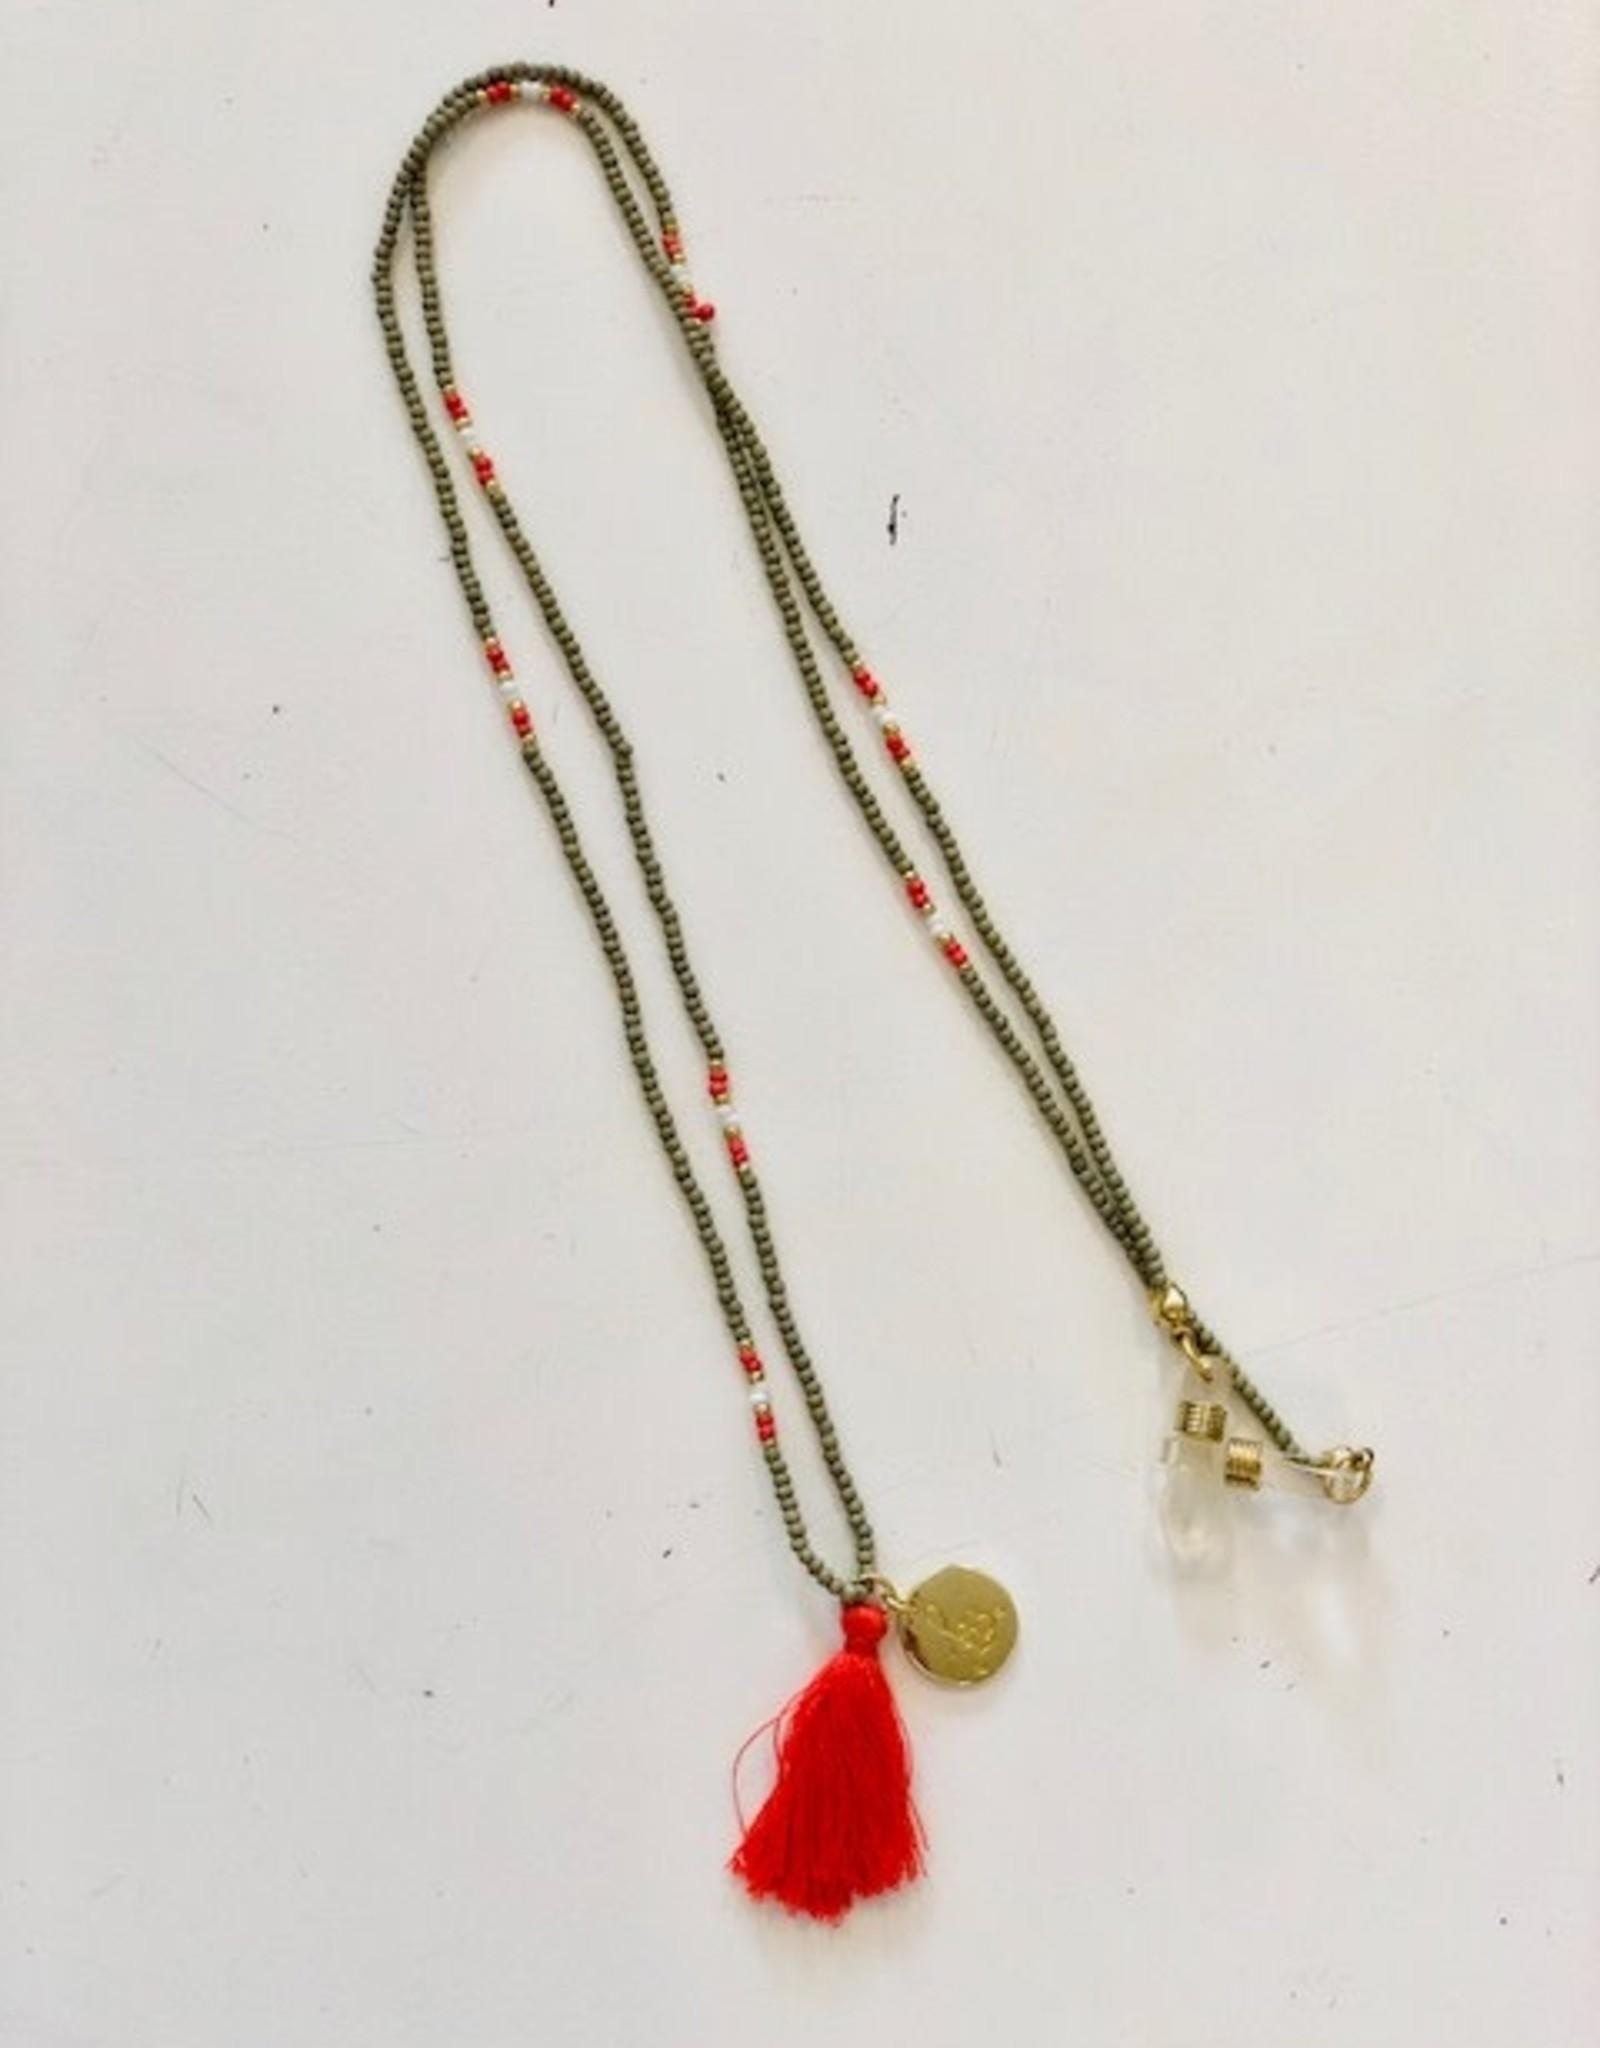 Bulu Bulu Happy Beads Suncords olive